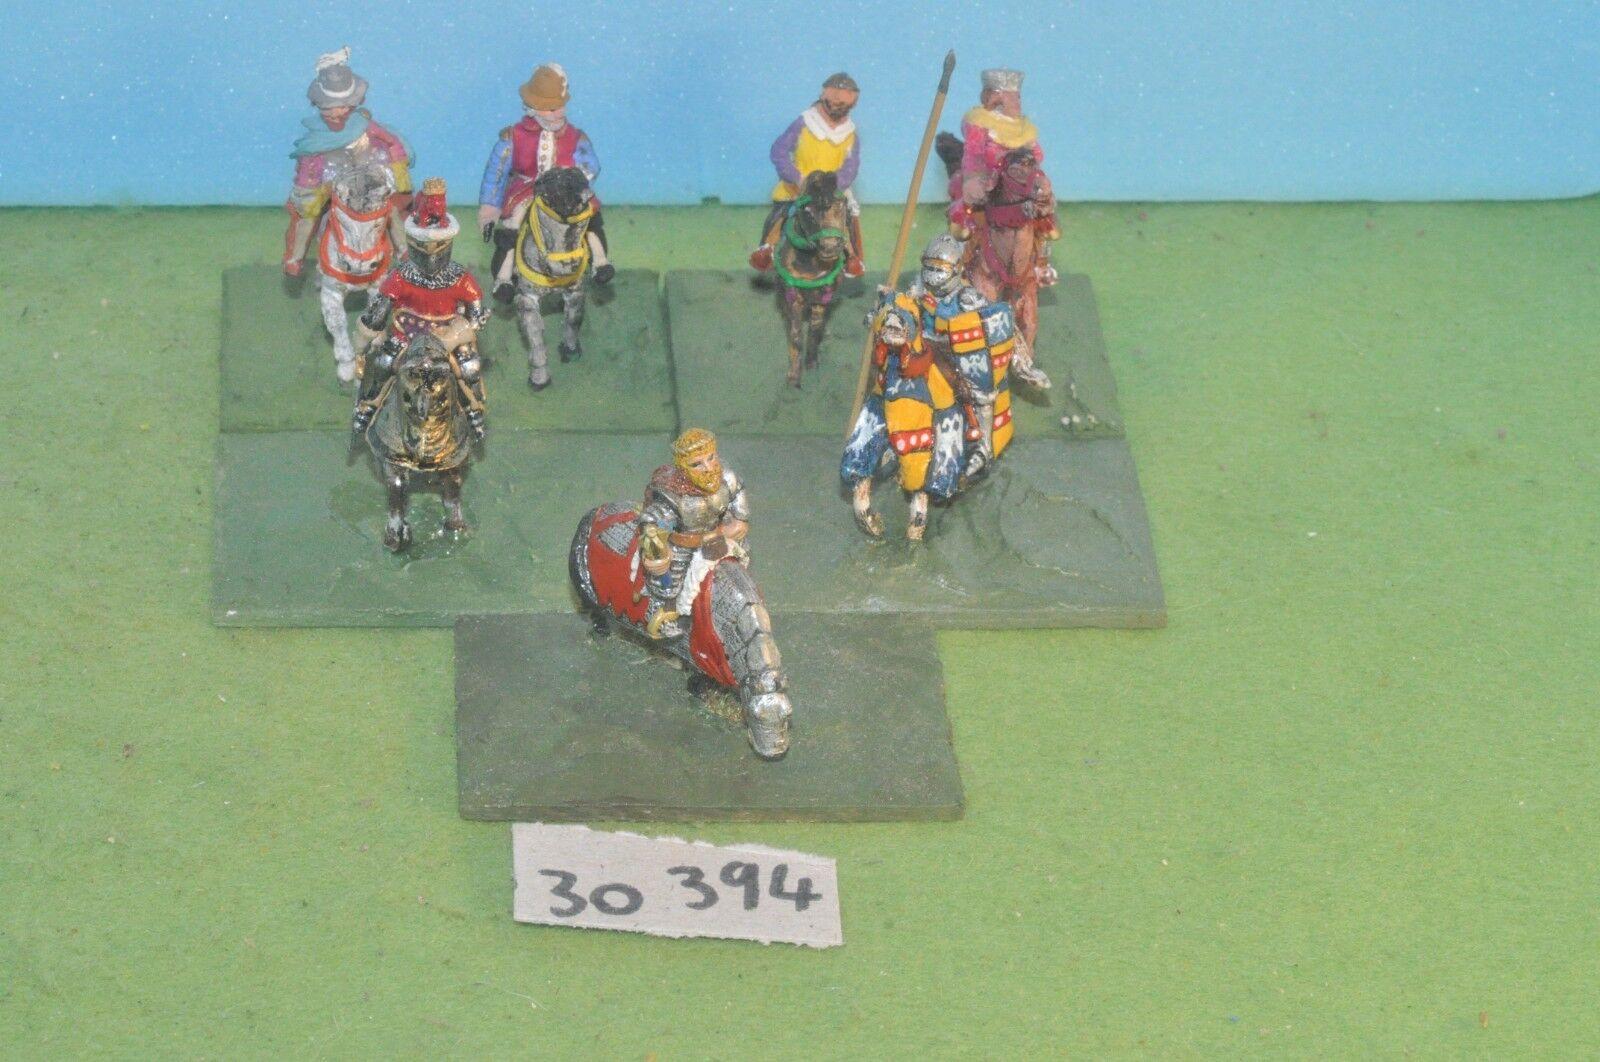 Fantasy sigmar 7 empire cavalry metal warhammer (30394)